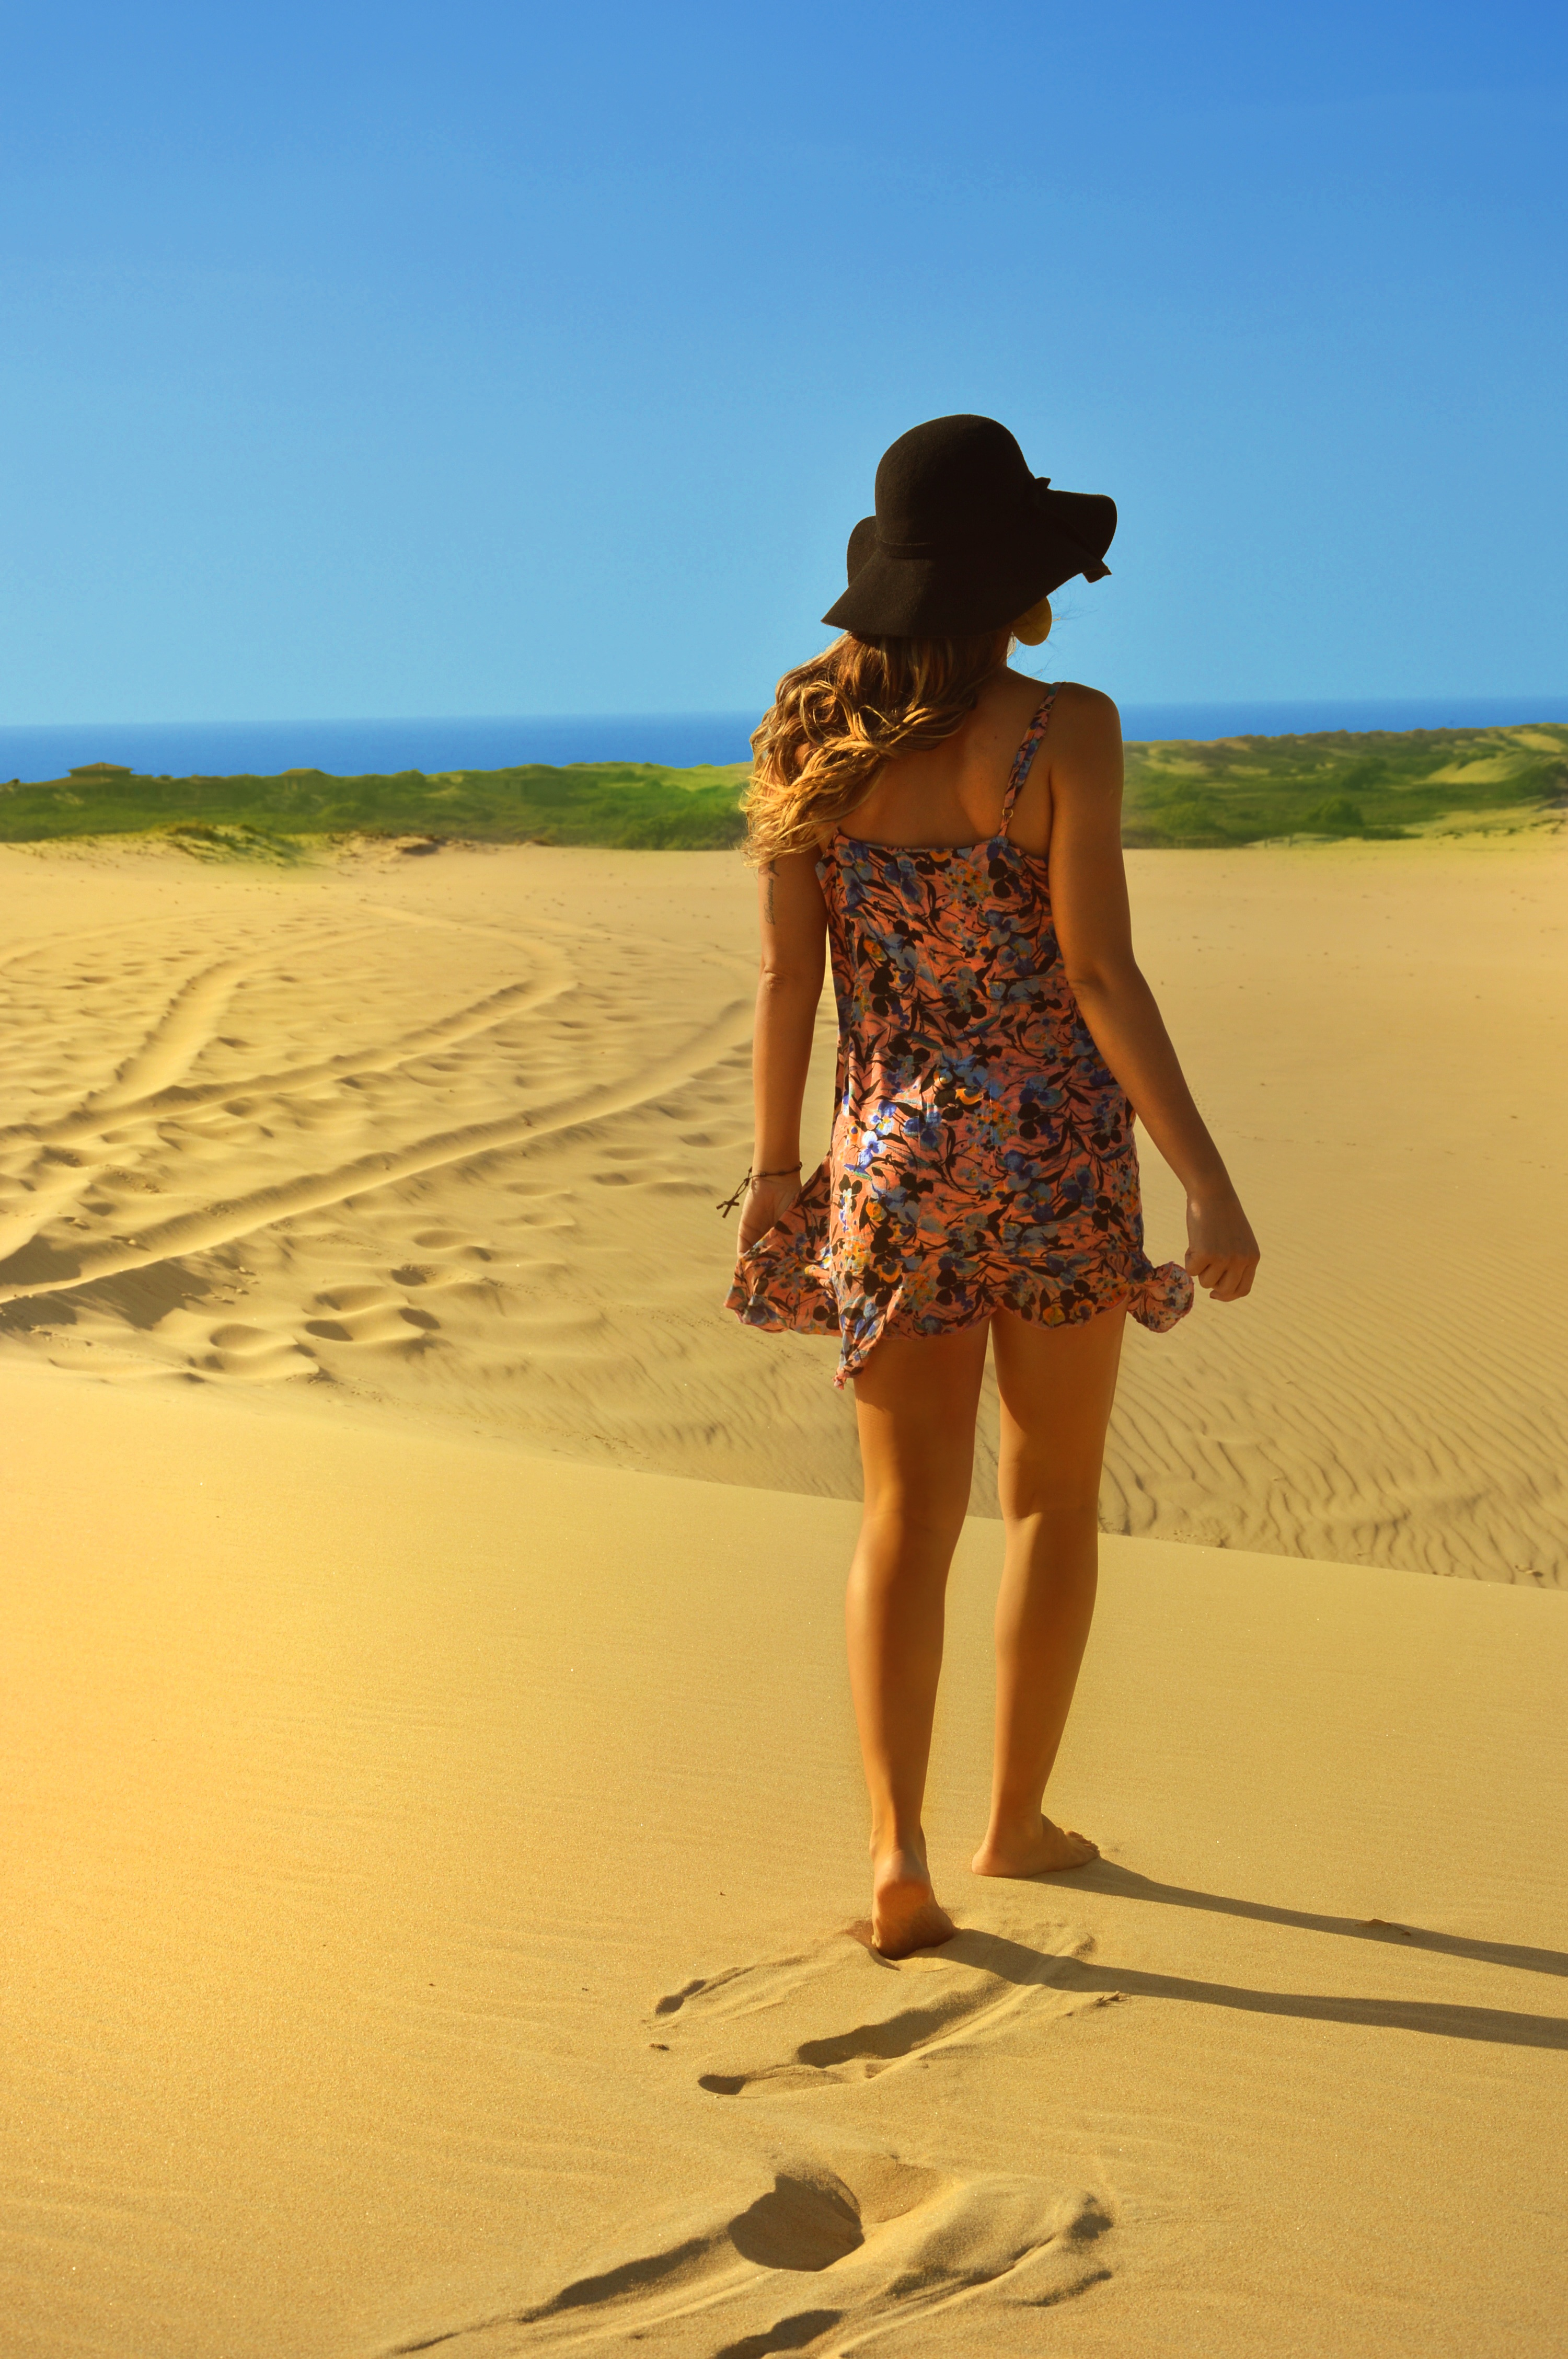 Sandy photo